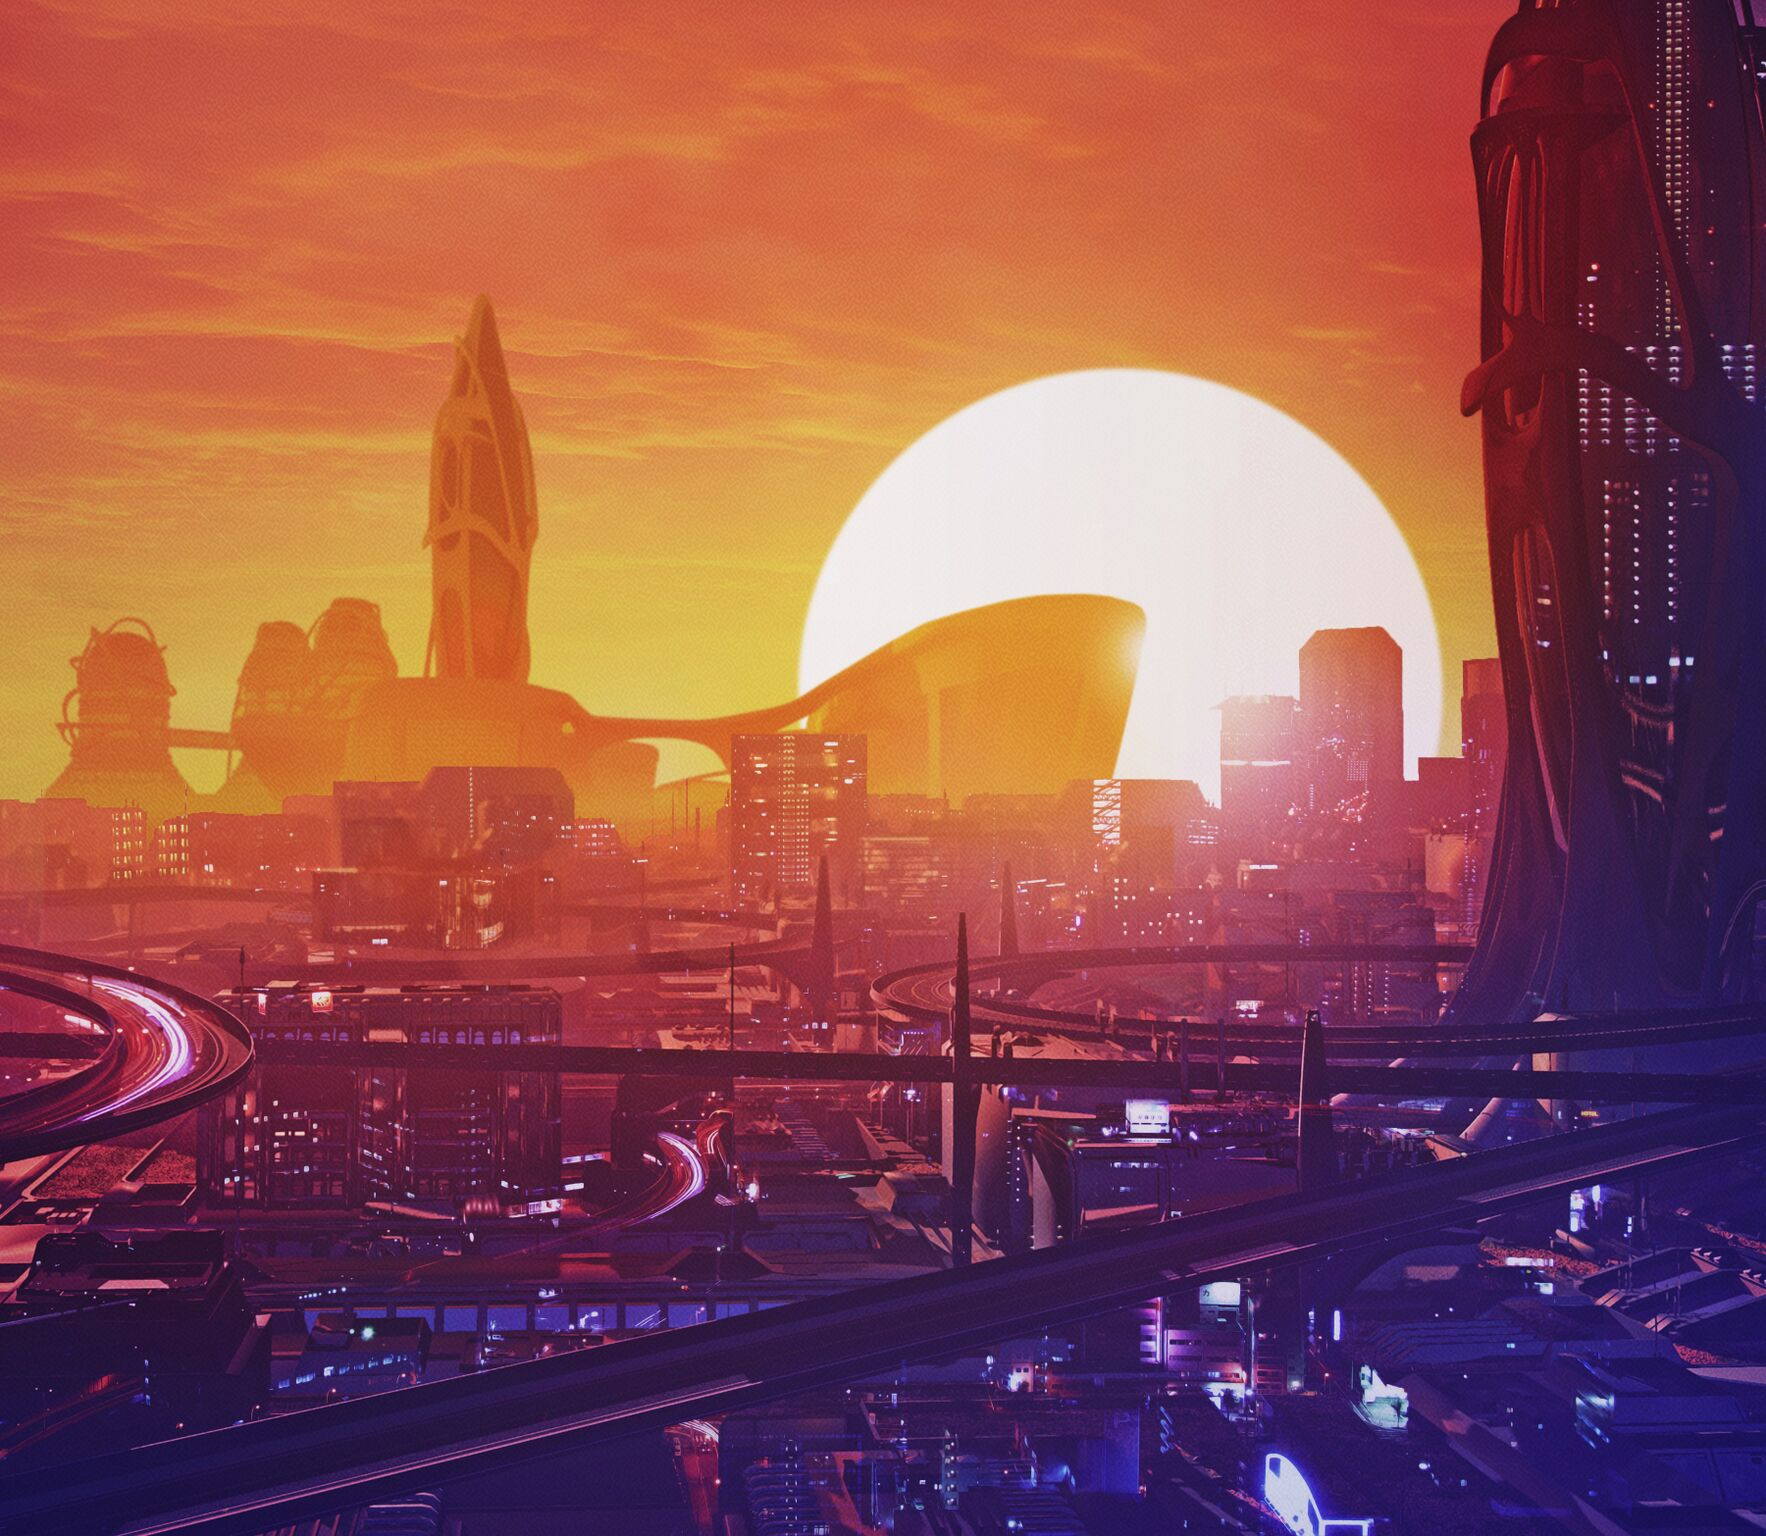 EDM Raven City Futuristic Music 1766x1536